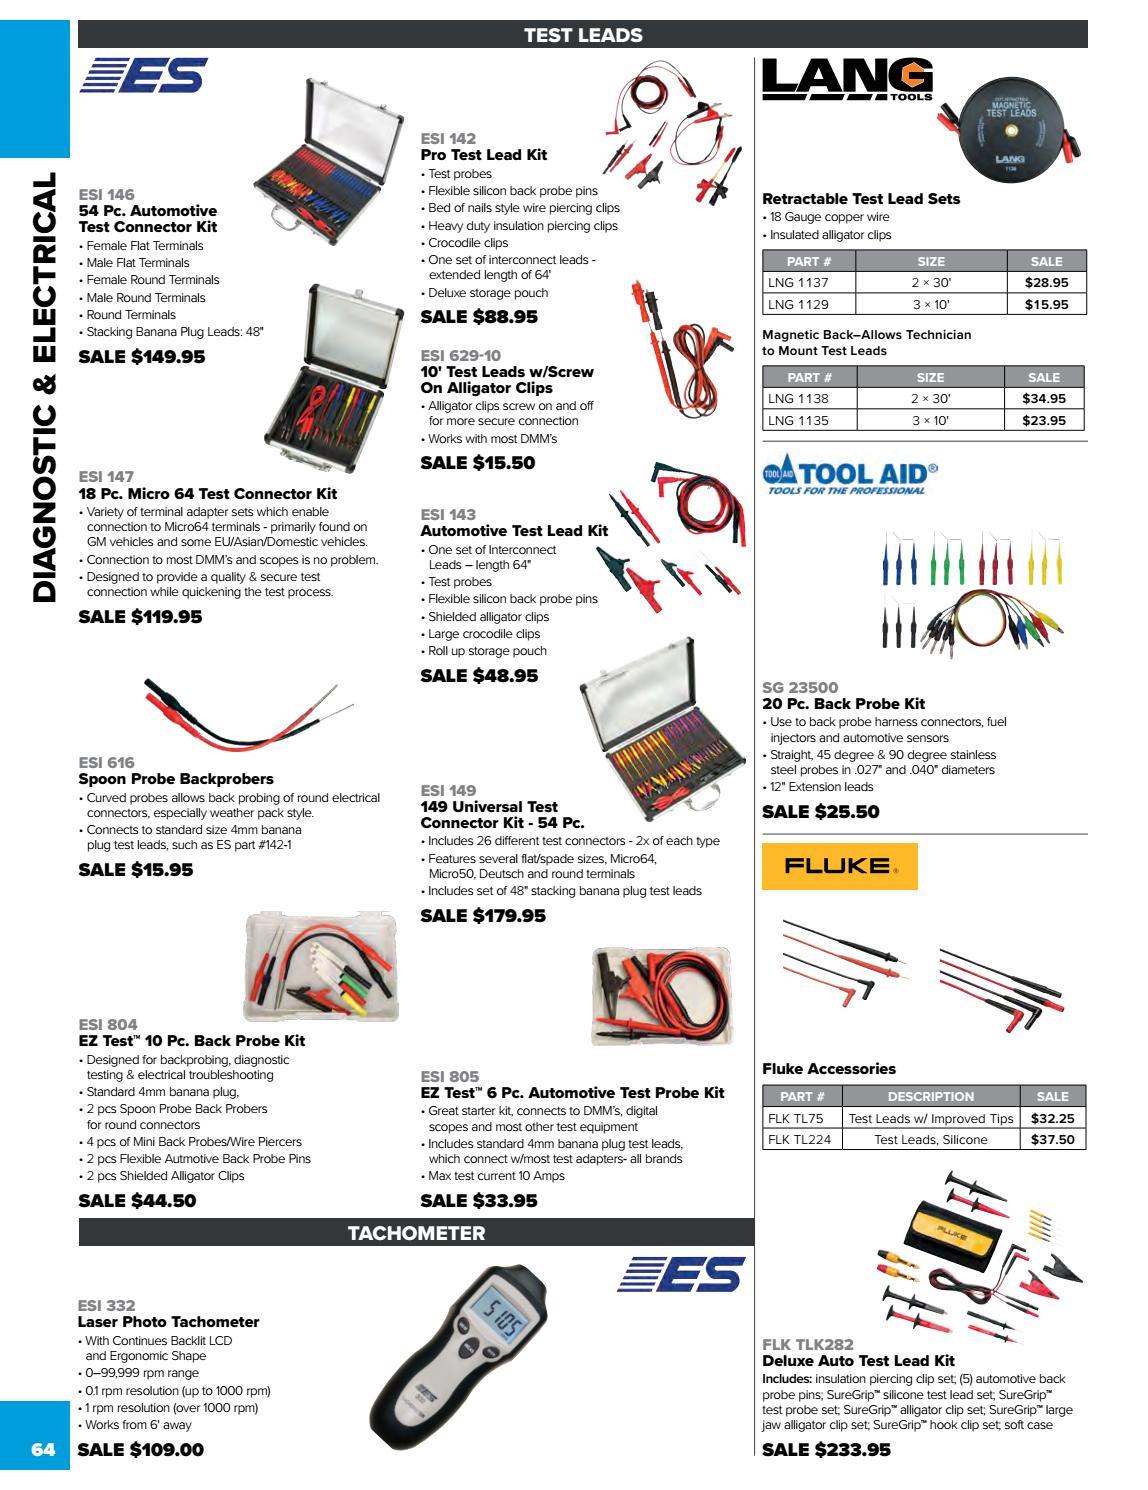 S/&G Tool Aid 23500 Back Probe Kit